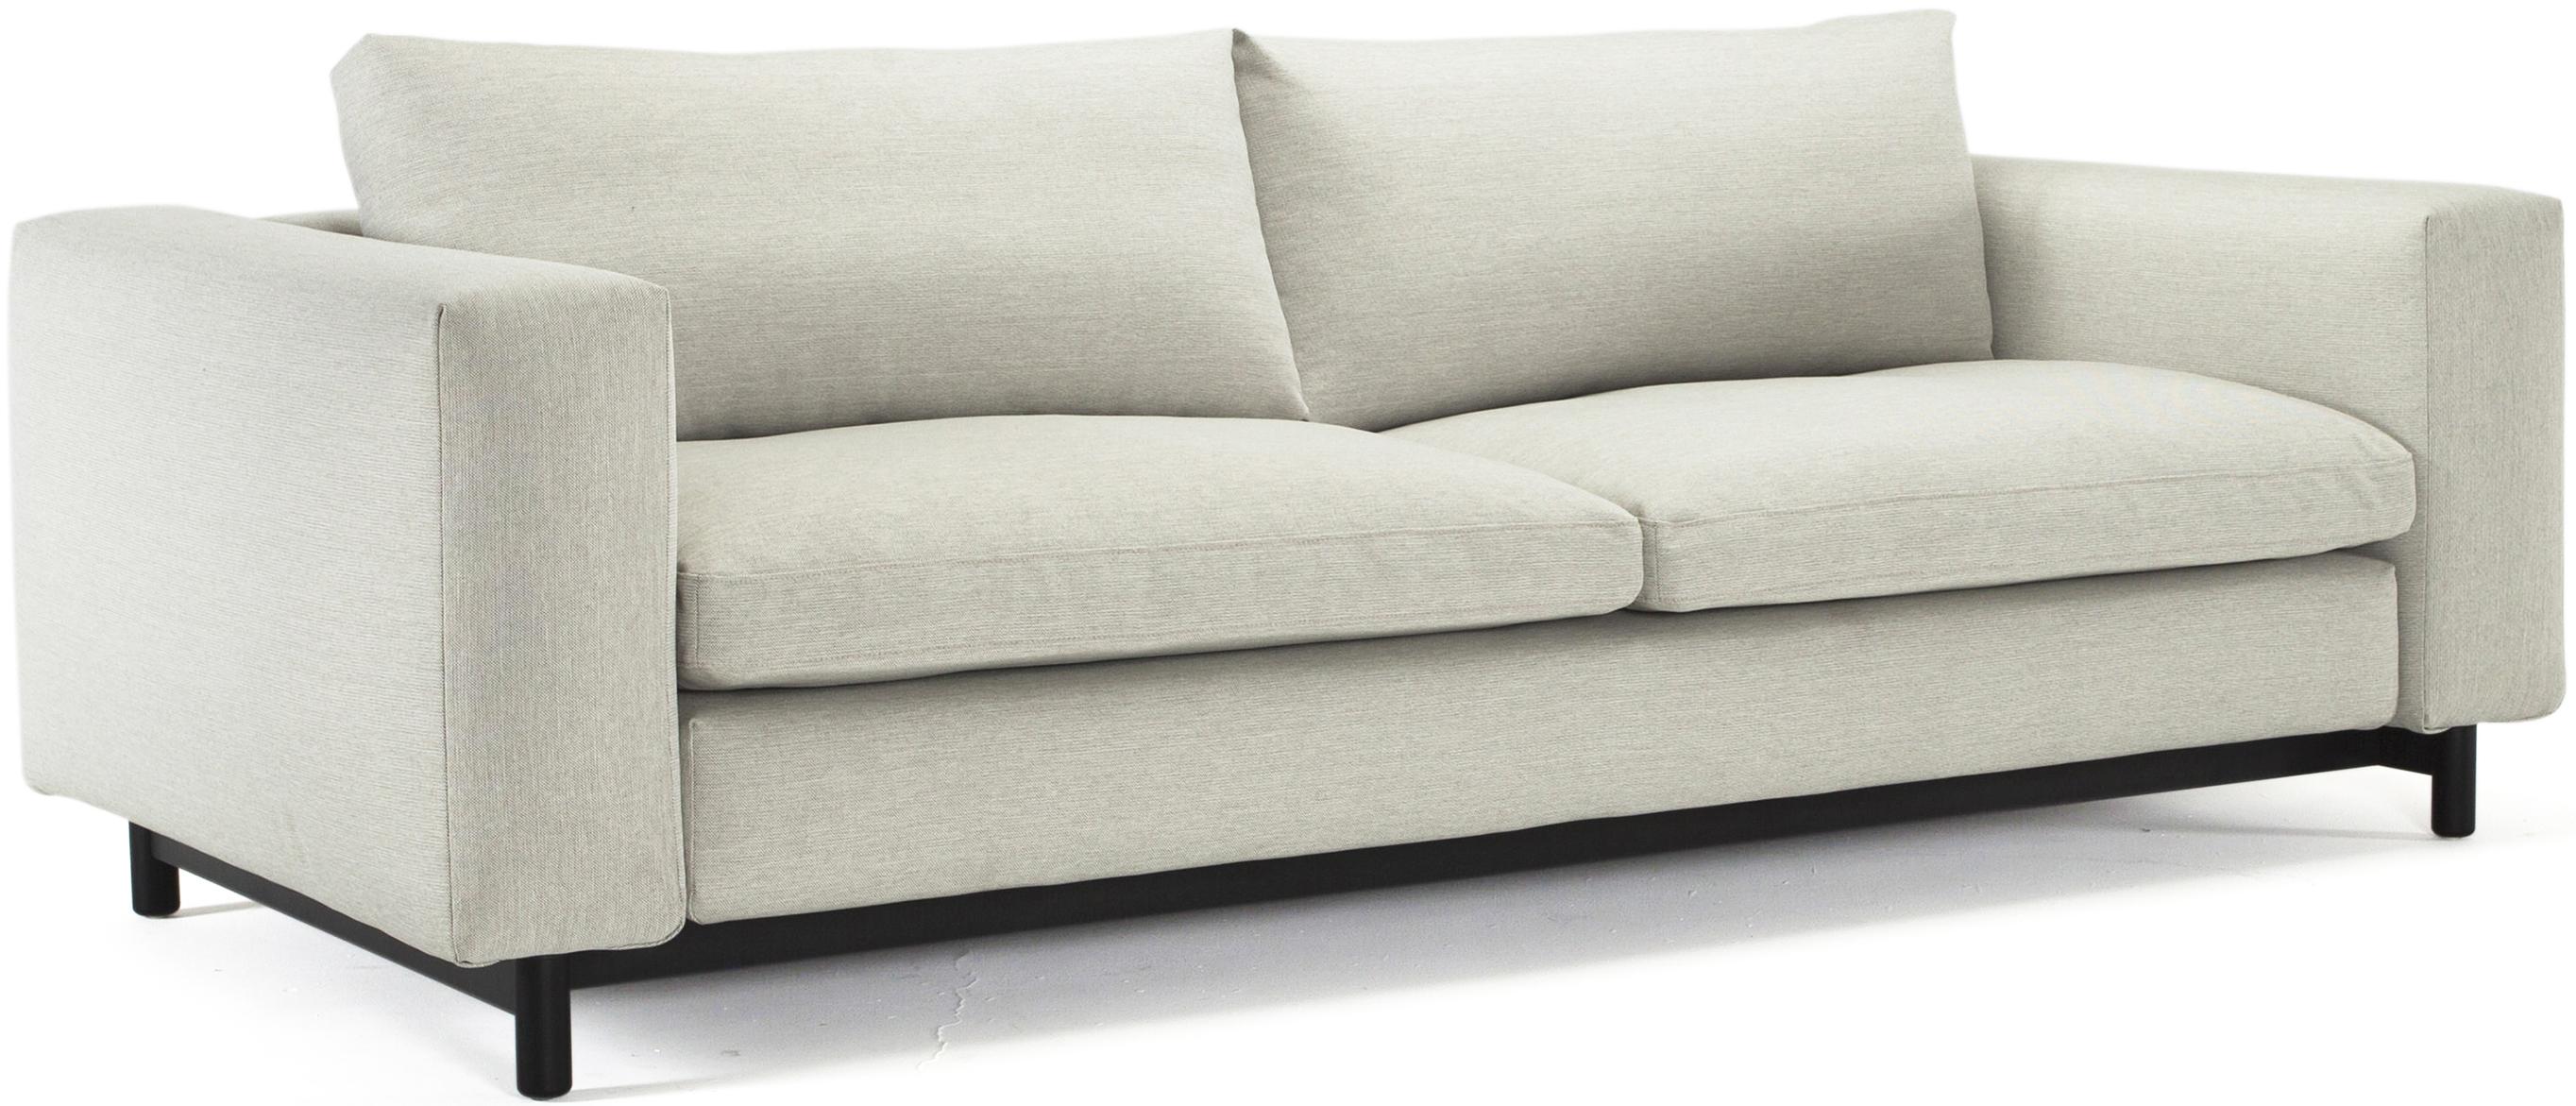 innovation living magni sofa